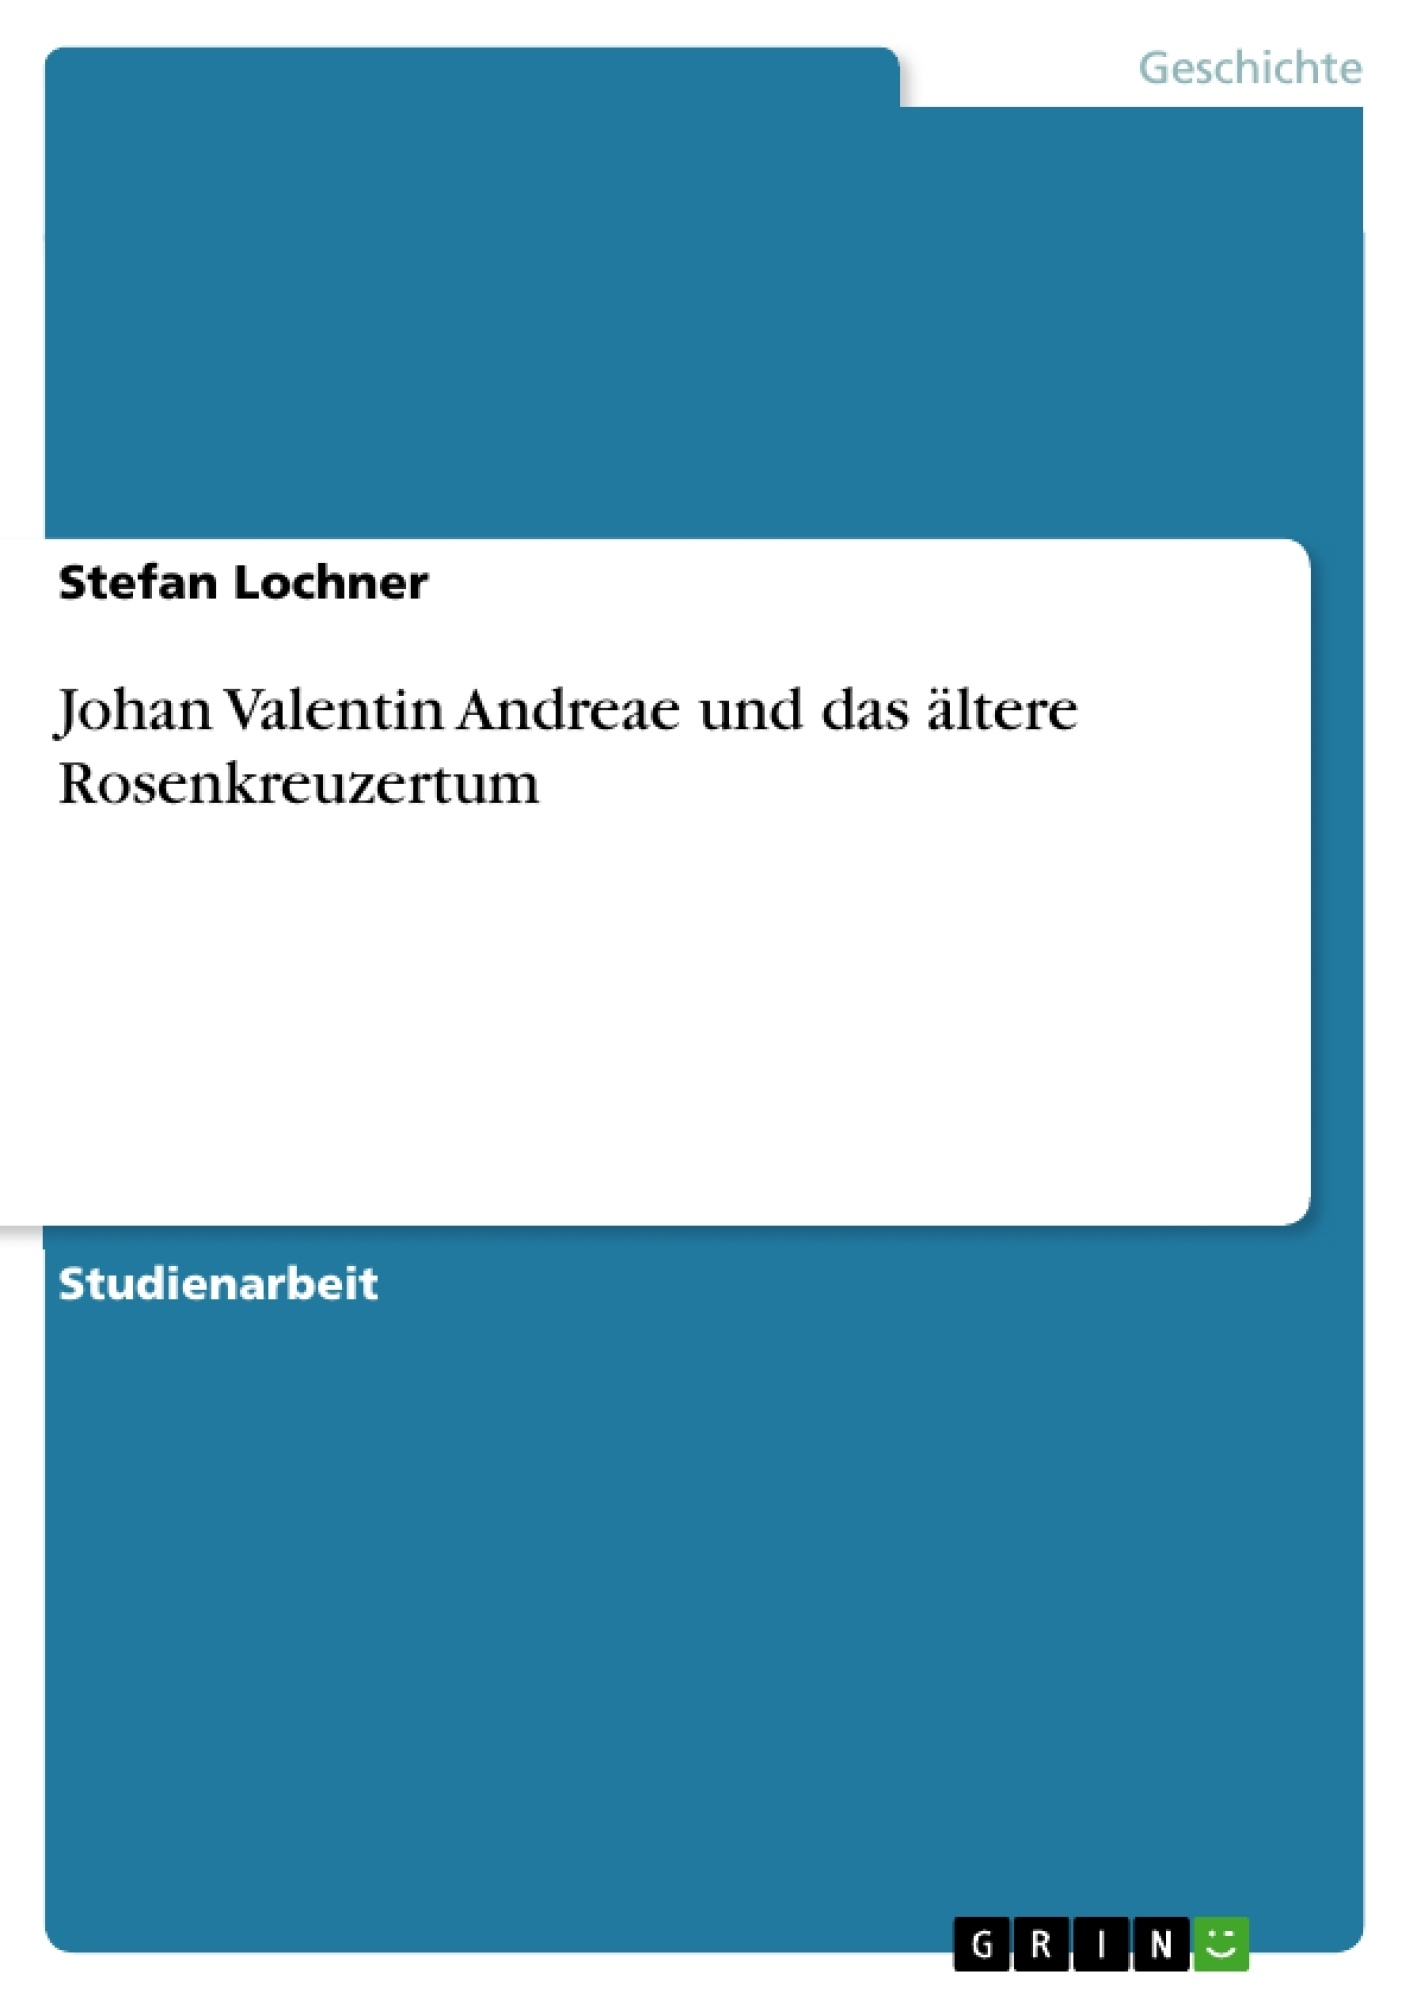 Titel: Johan Valentin Andreae und das ältere Rosenkreuzertum